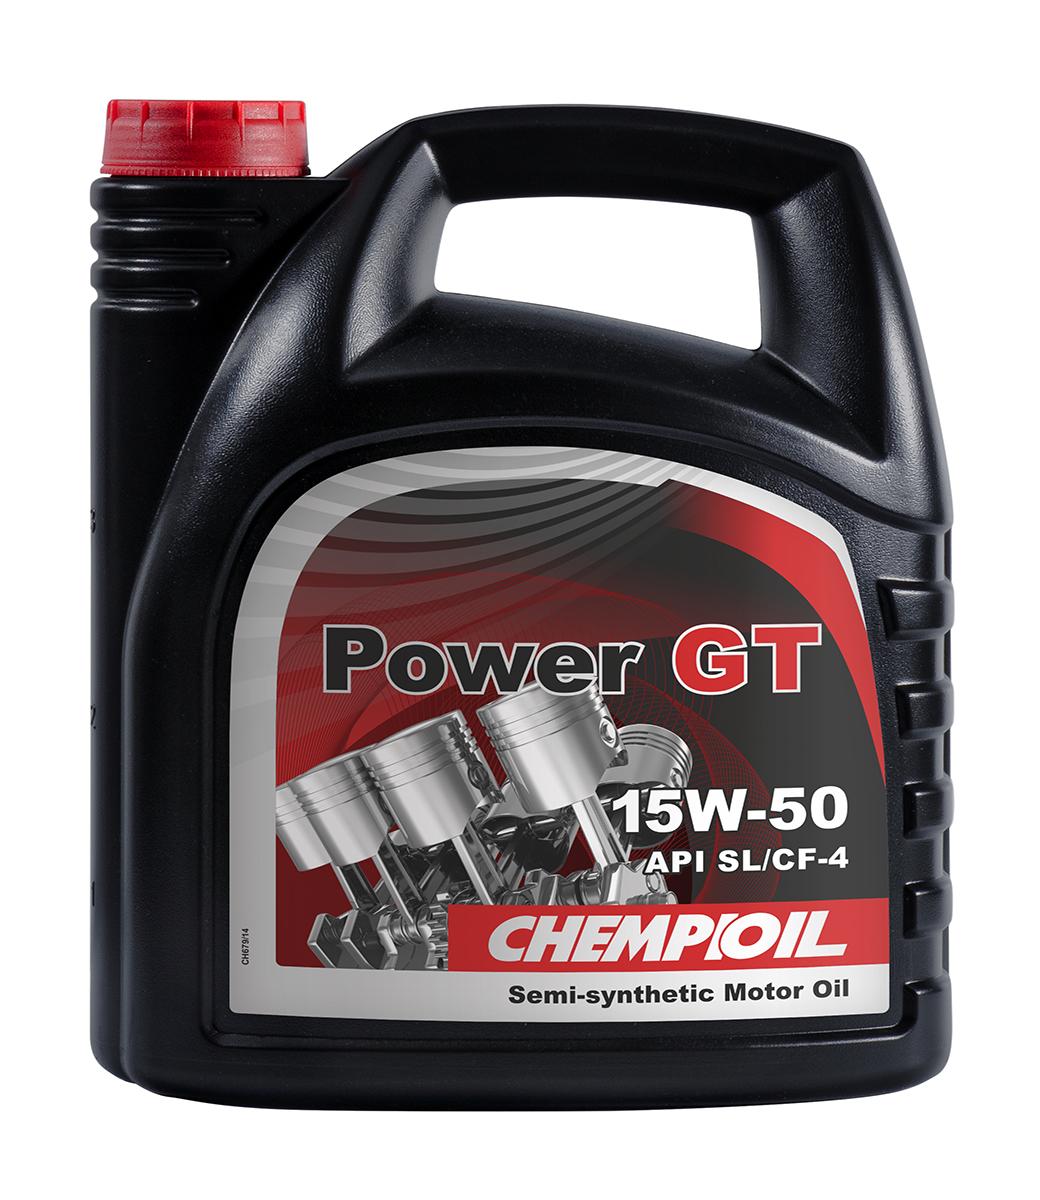 POWER GT 15W-50